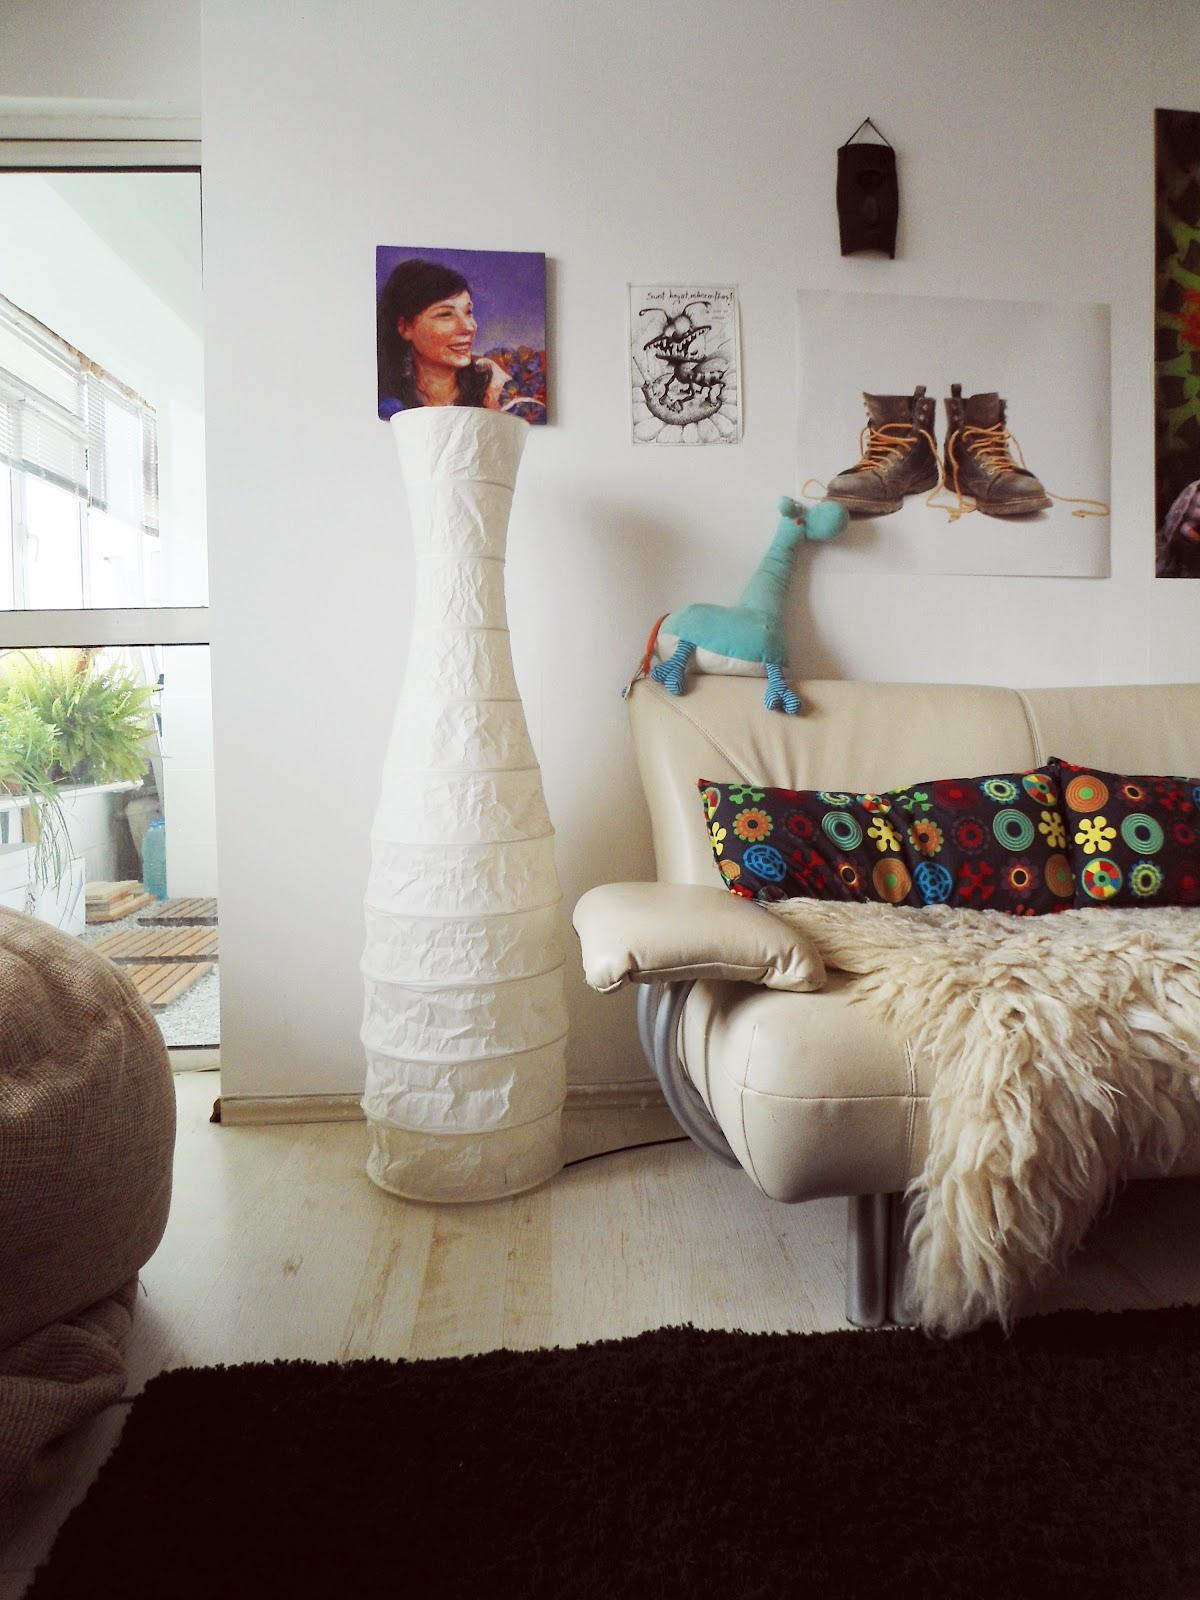 ikea lamps. Black Bedroom Furniture Sets. Home Design Ideas